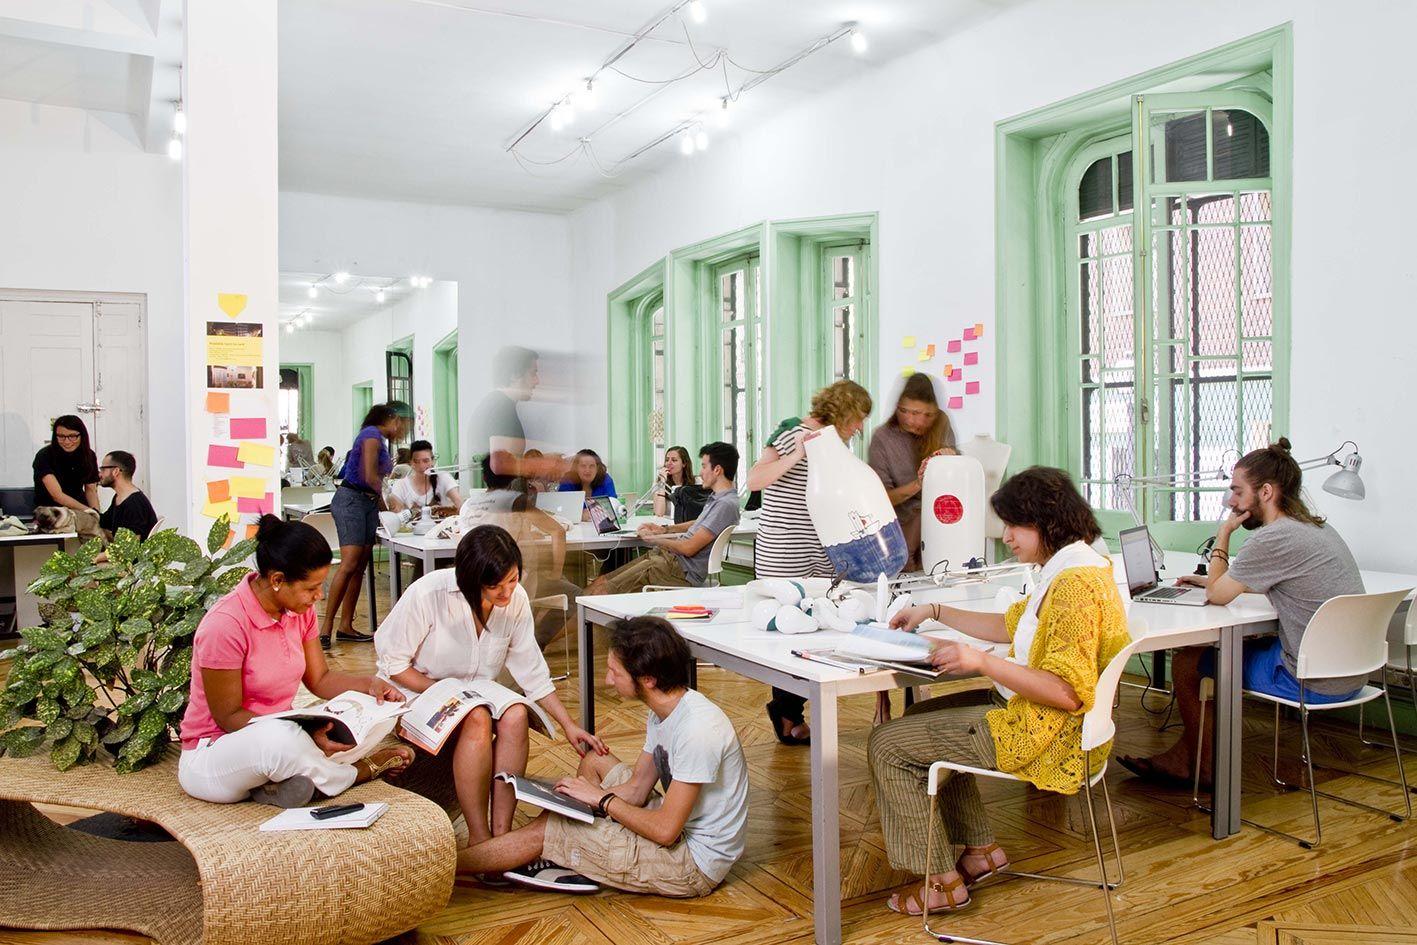 Cursos de verano para adultos aprovechando un momento for Cursos interiorismo madrid